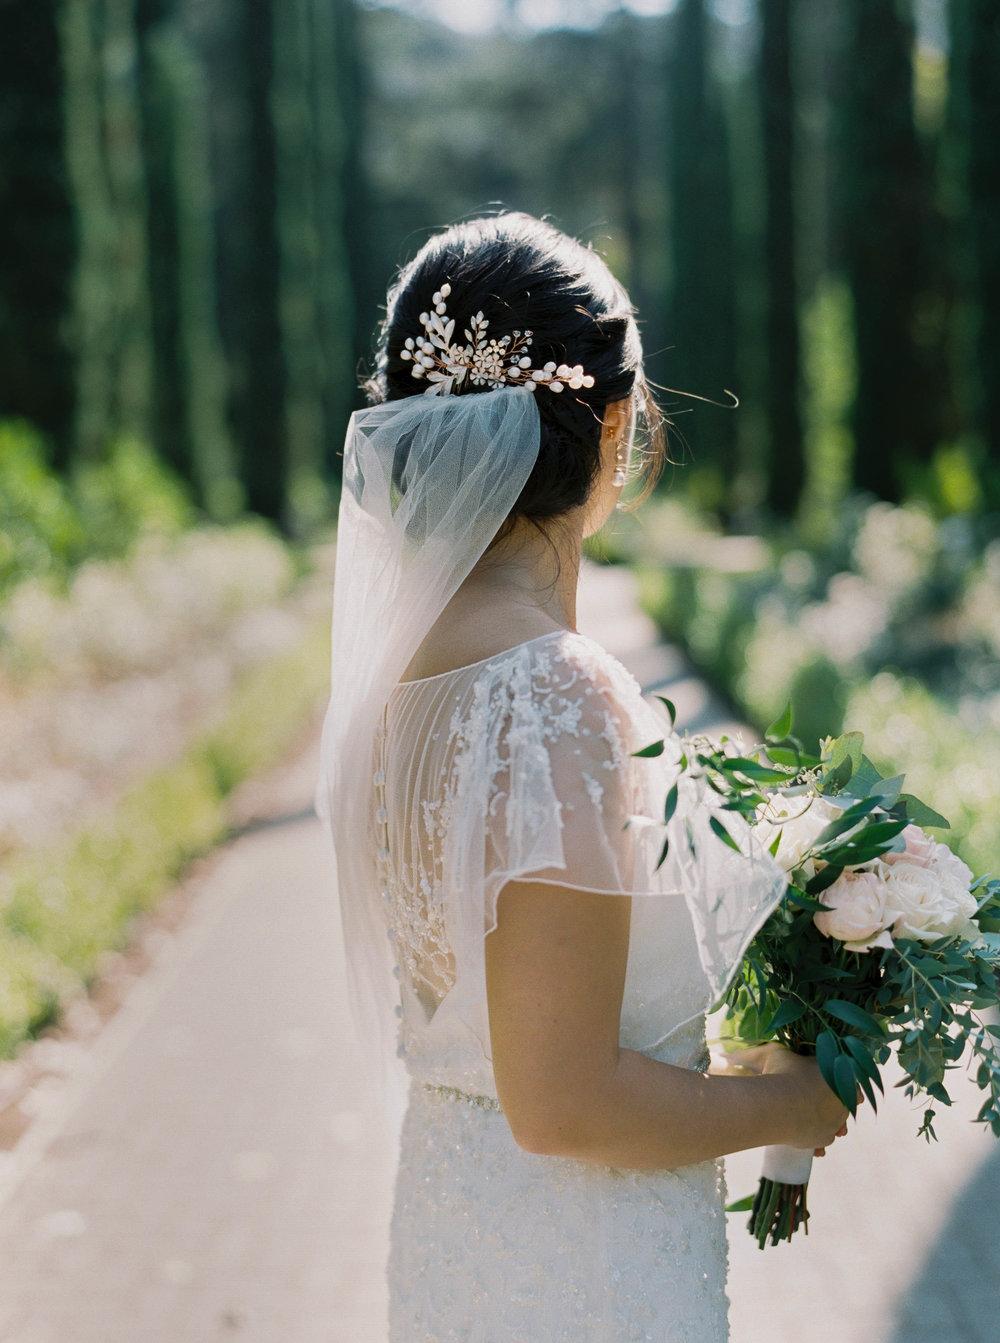 Villa_Montalvo_Wedding_Photographer_Videographer_San_Francisco079.jpg